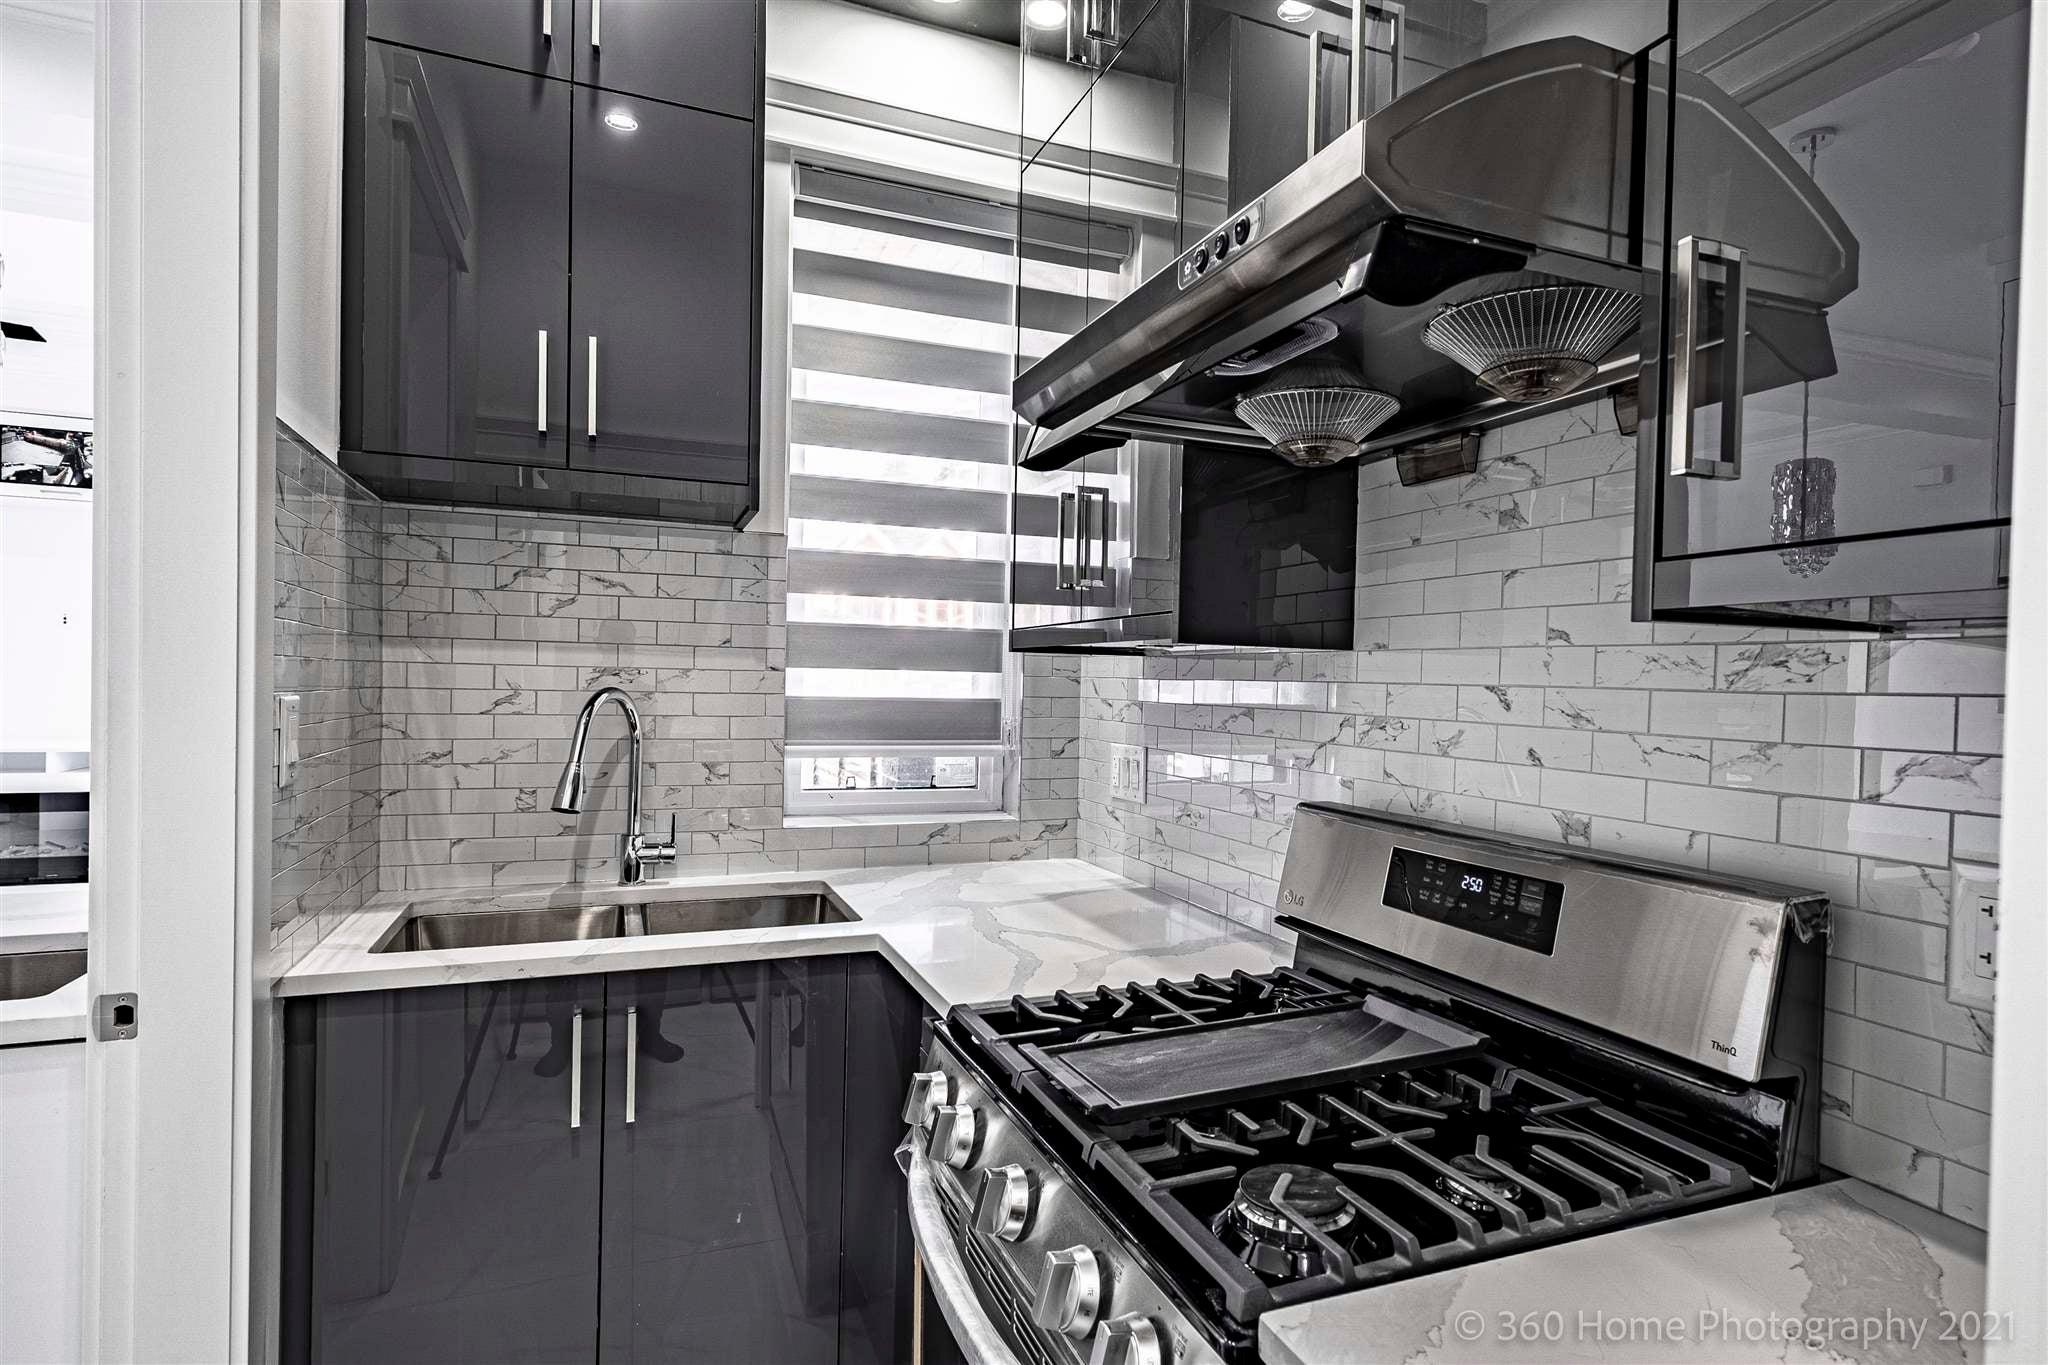 13050 101B AVENUE - Cedar Hills House/Single Family for sale, 5 Bedrooms (R2602208) - #11